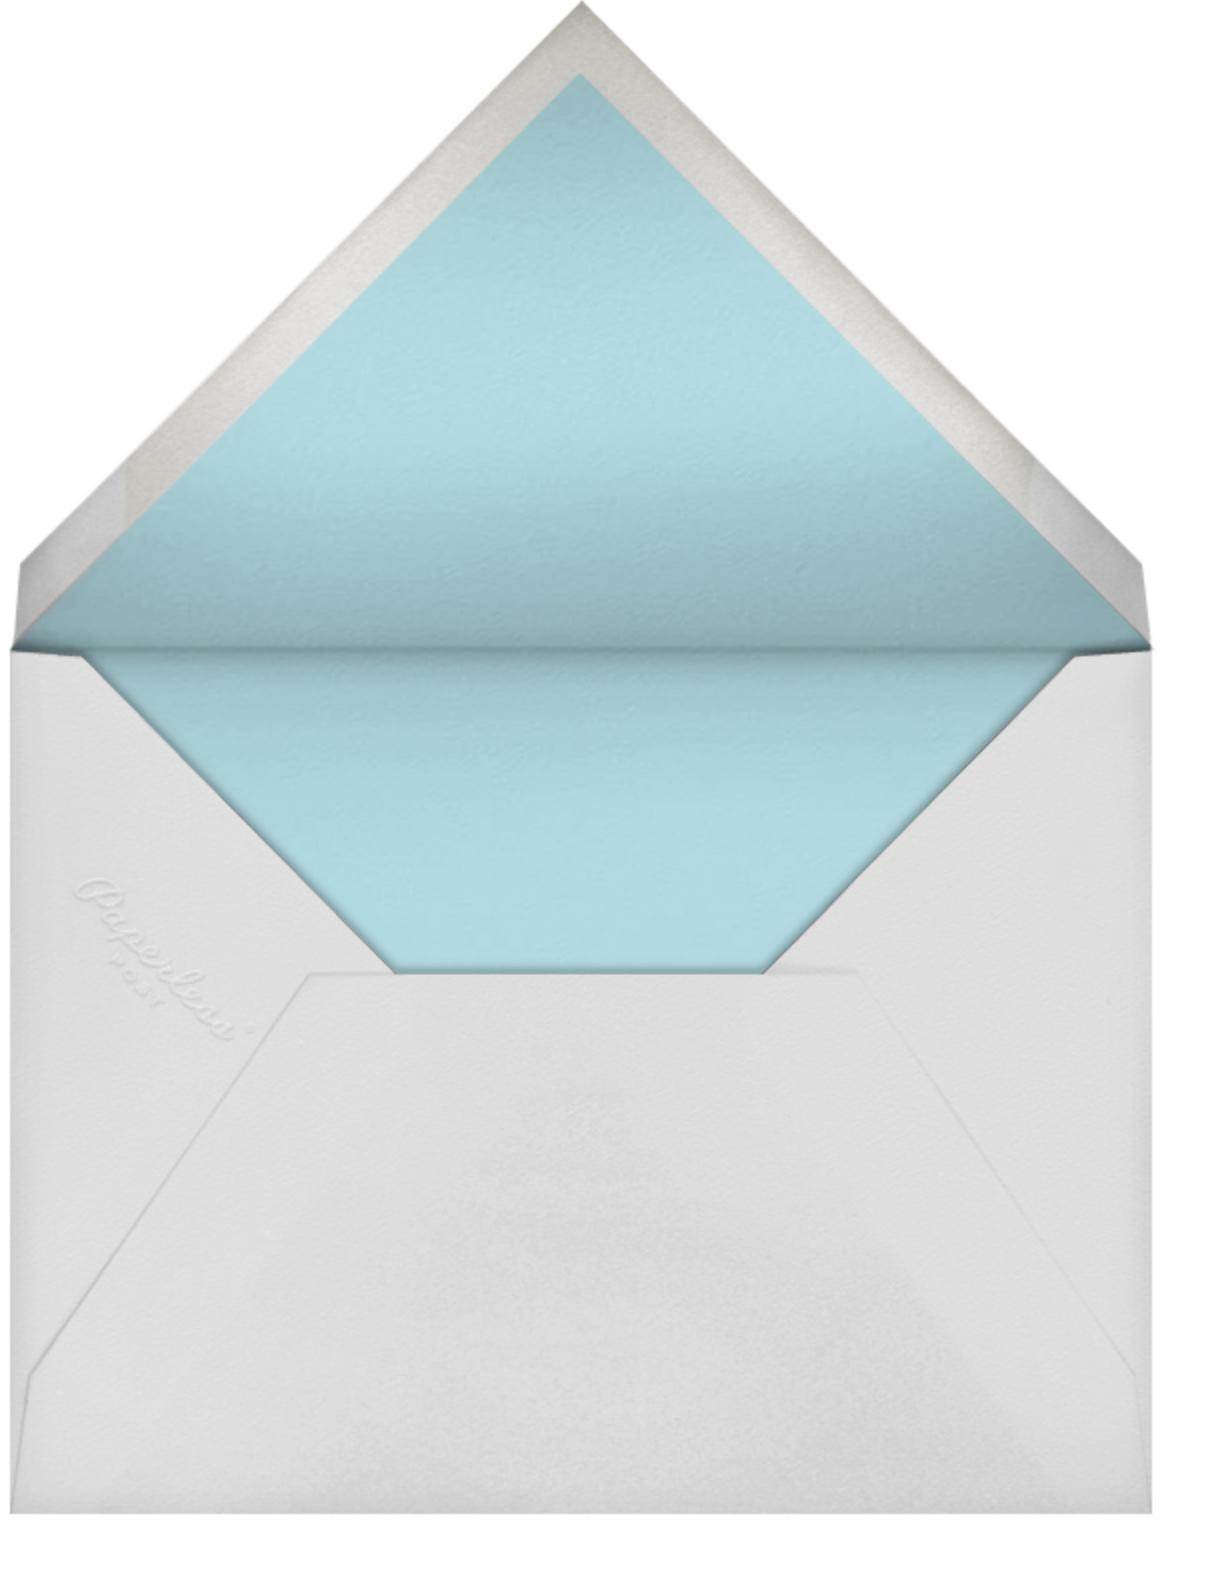 Ellis Hall II (Stationery) - Silver - kate spade new york - General - envelope back